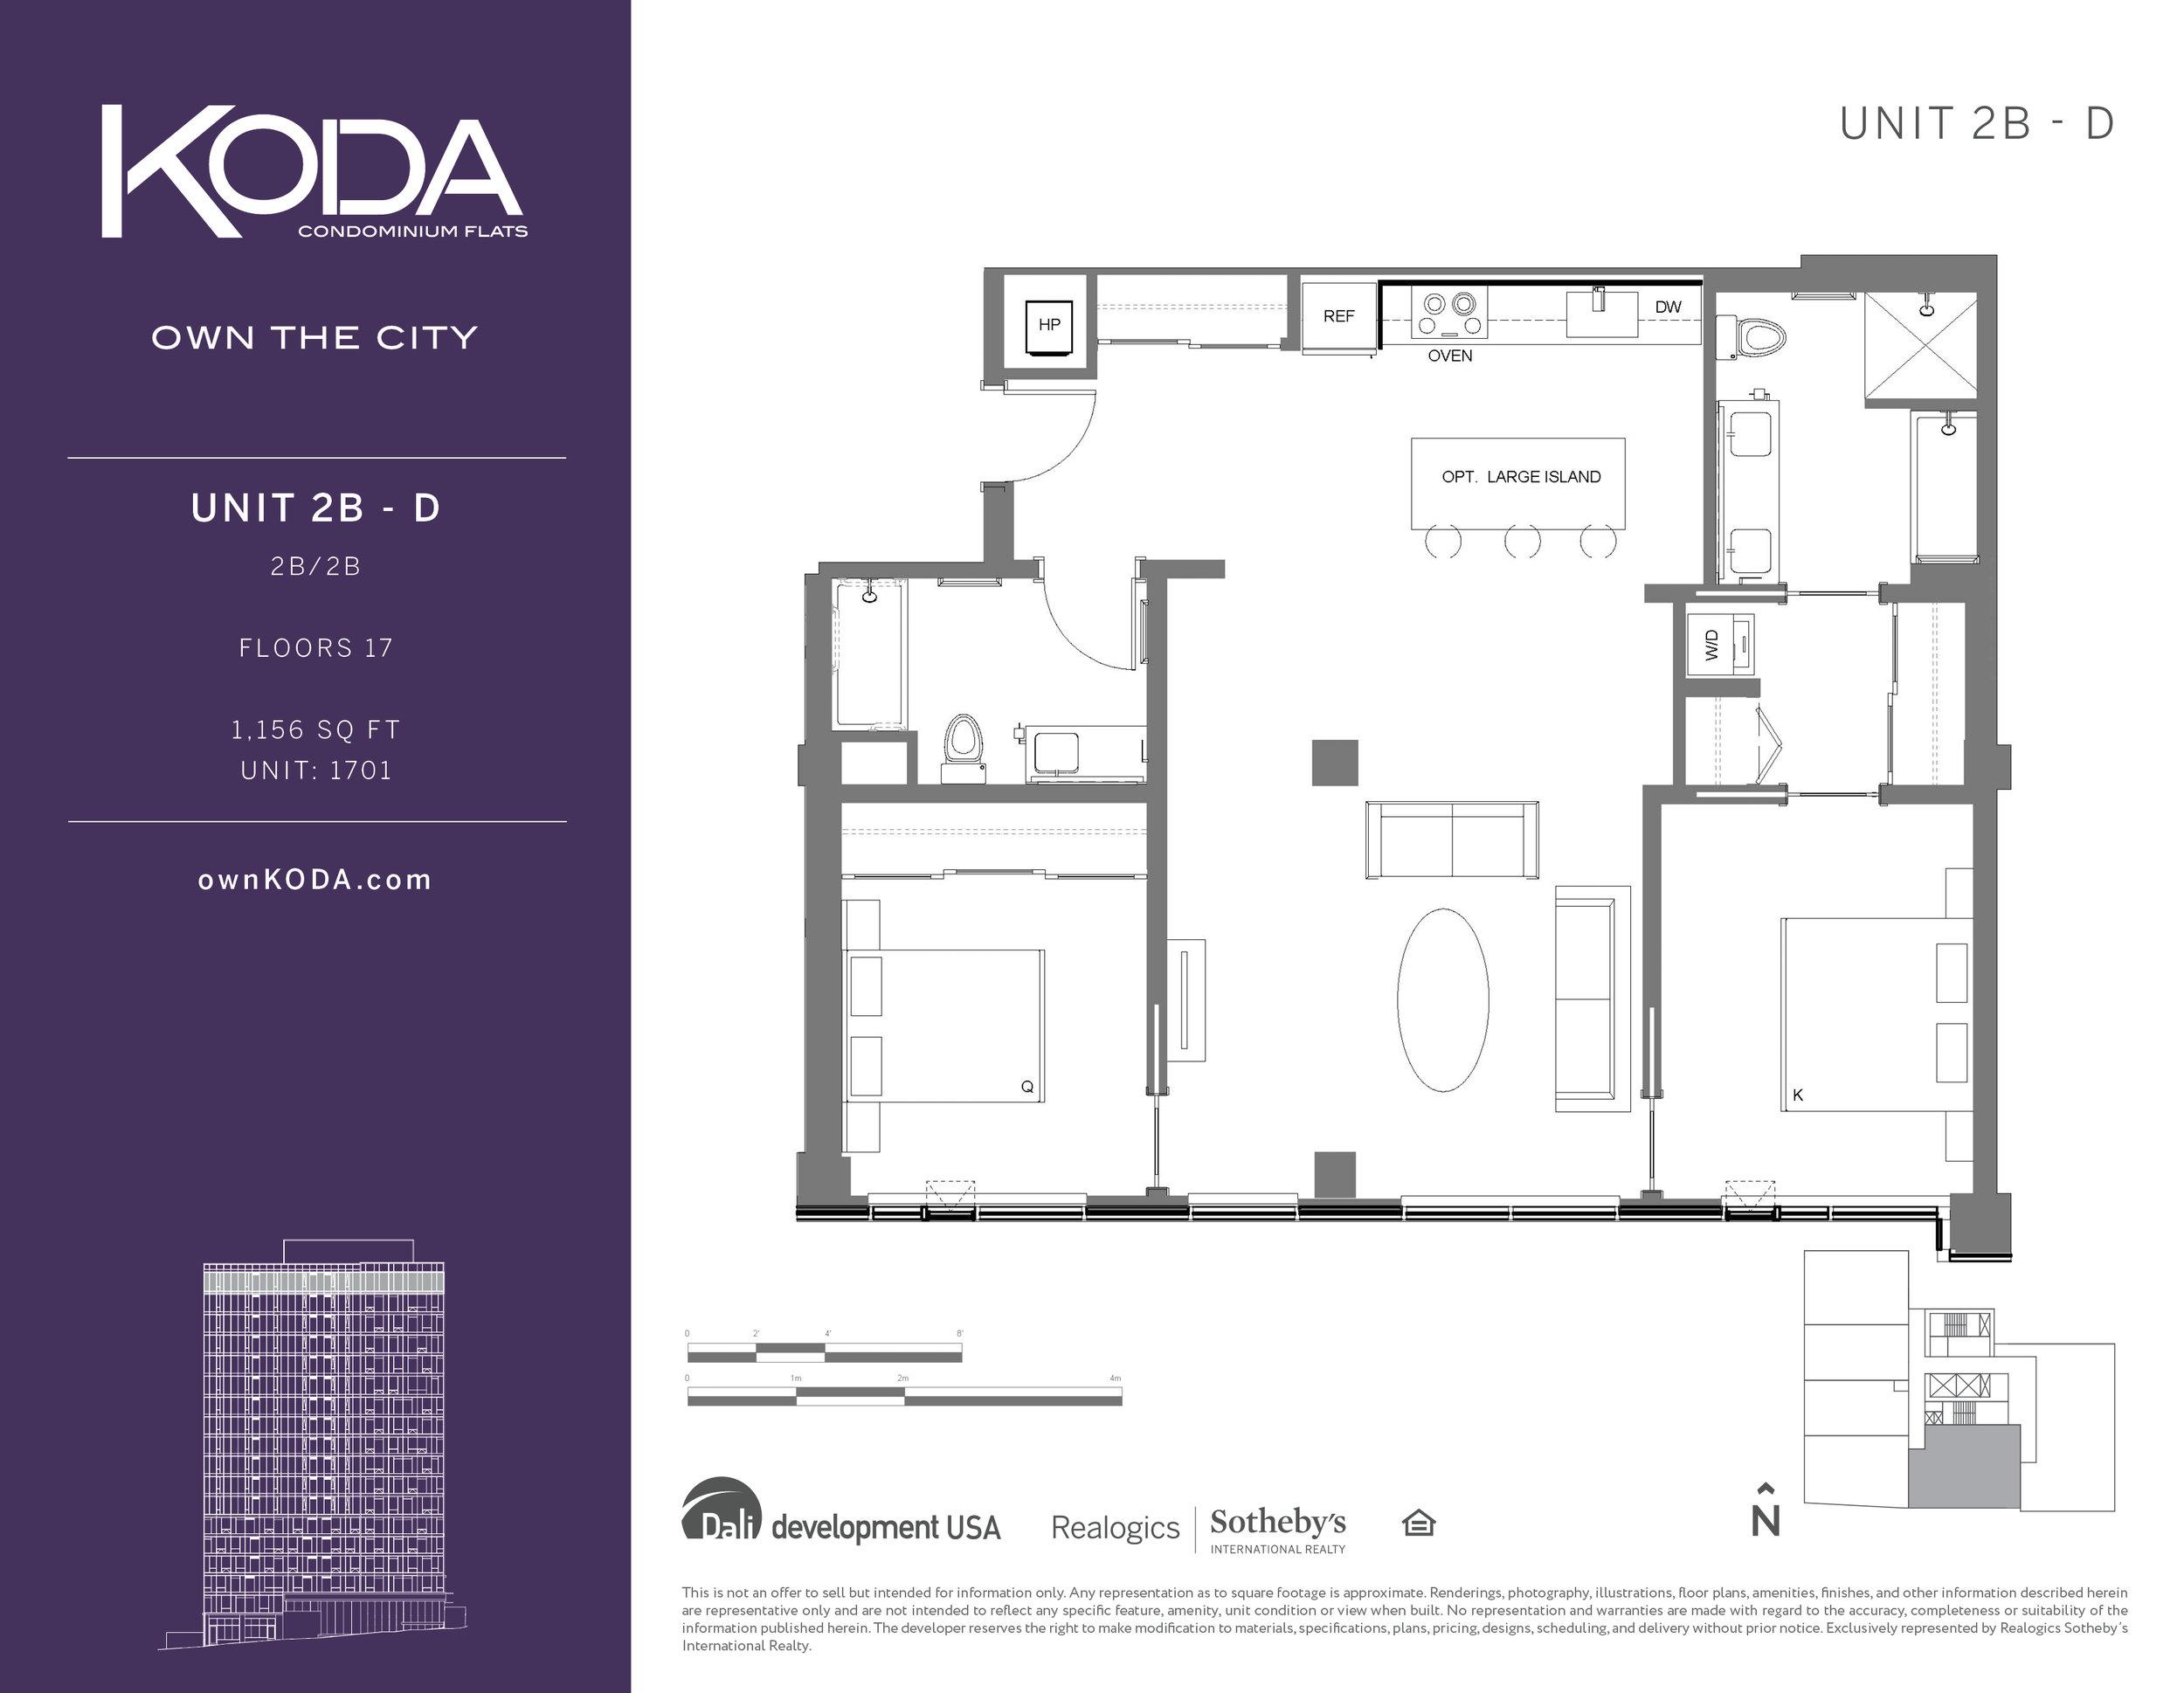 KODA_FloorPlanFlyer_Update_Approved_04.04.19_Release29.jpg